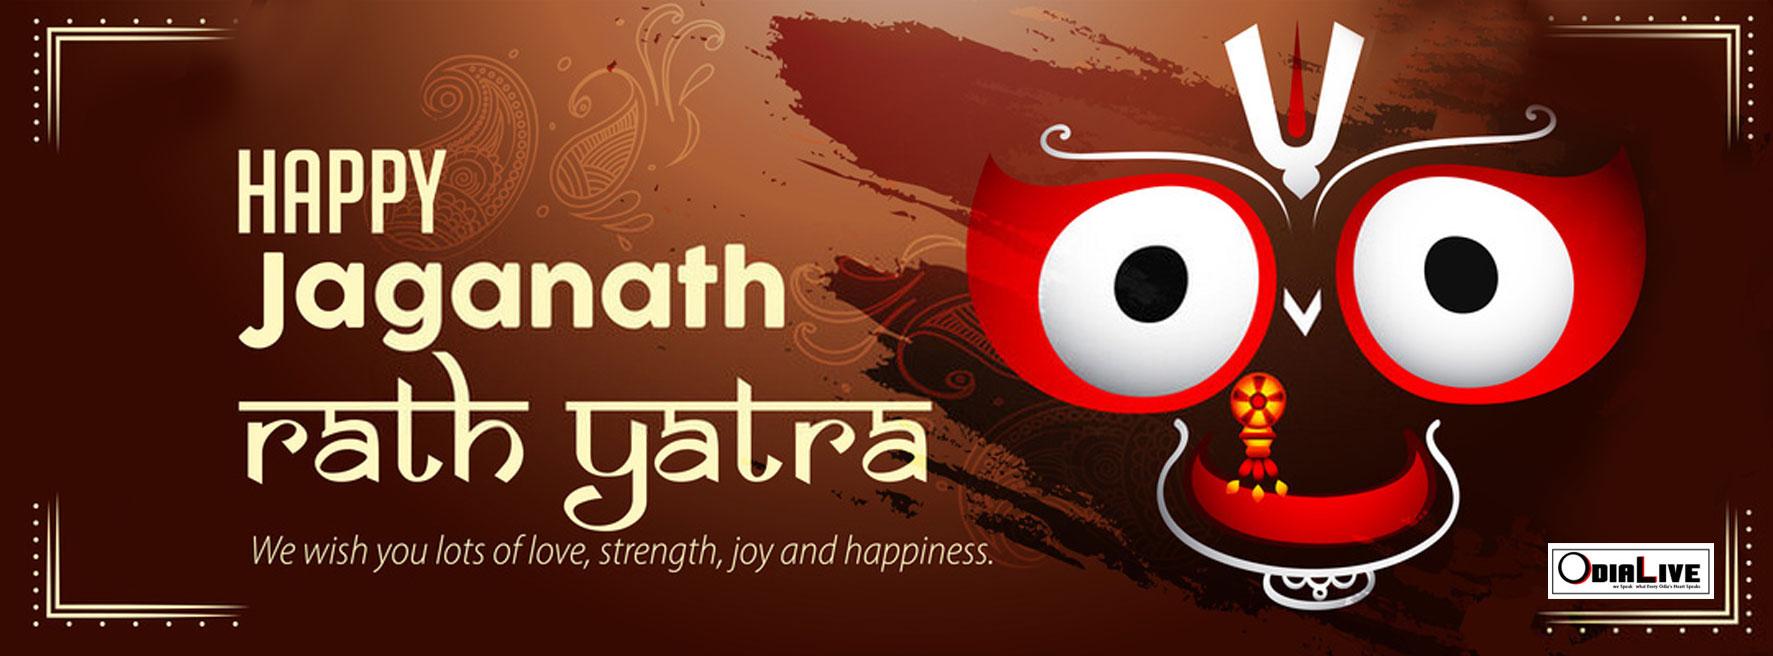 Puri Jagannath Ratha Yatra Facebook Covers